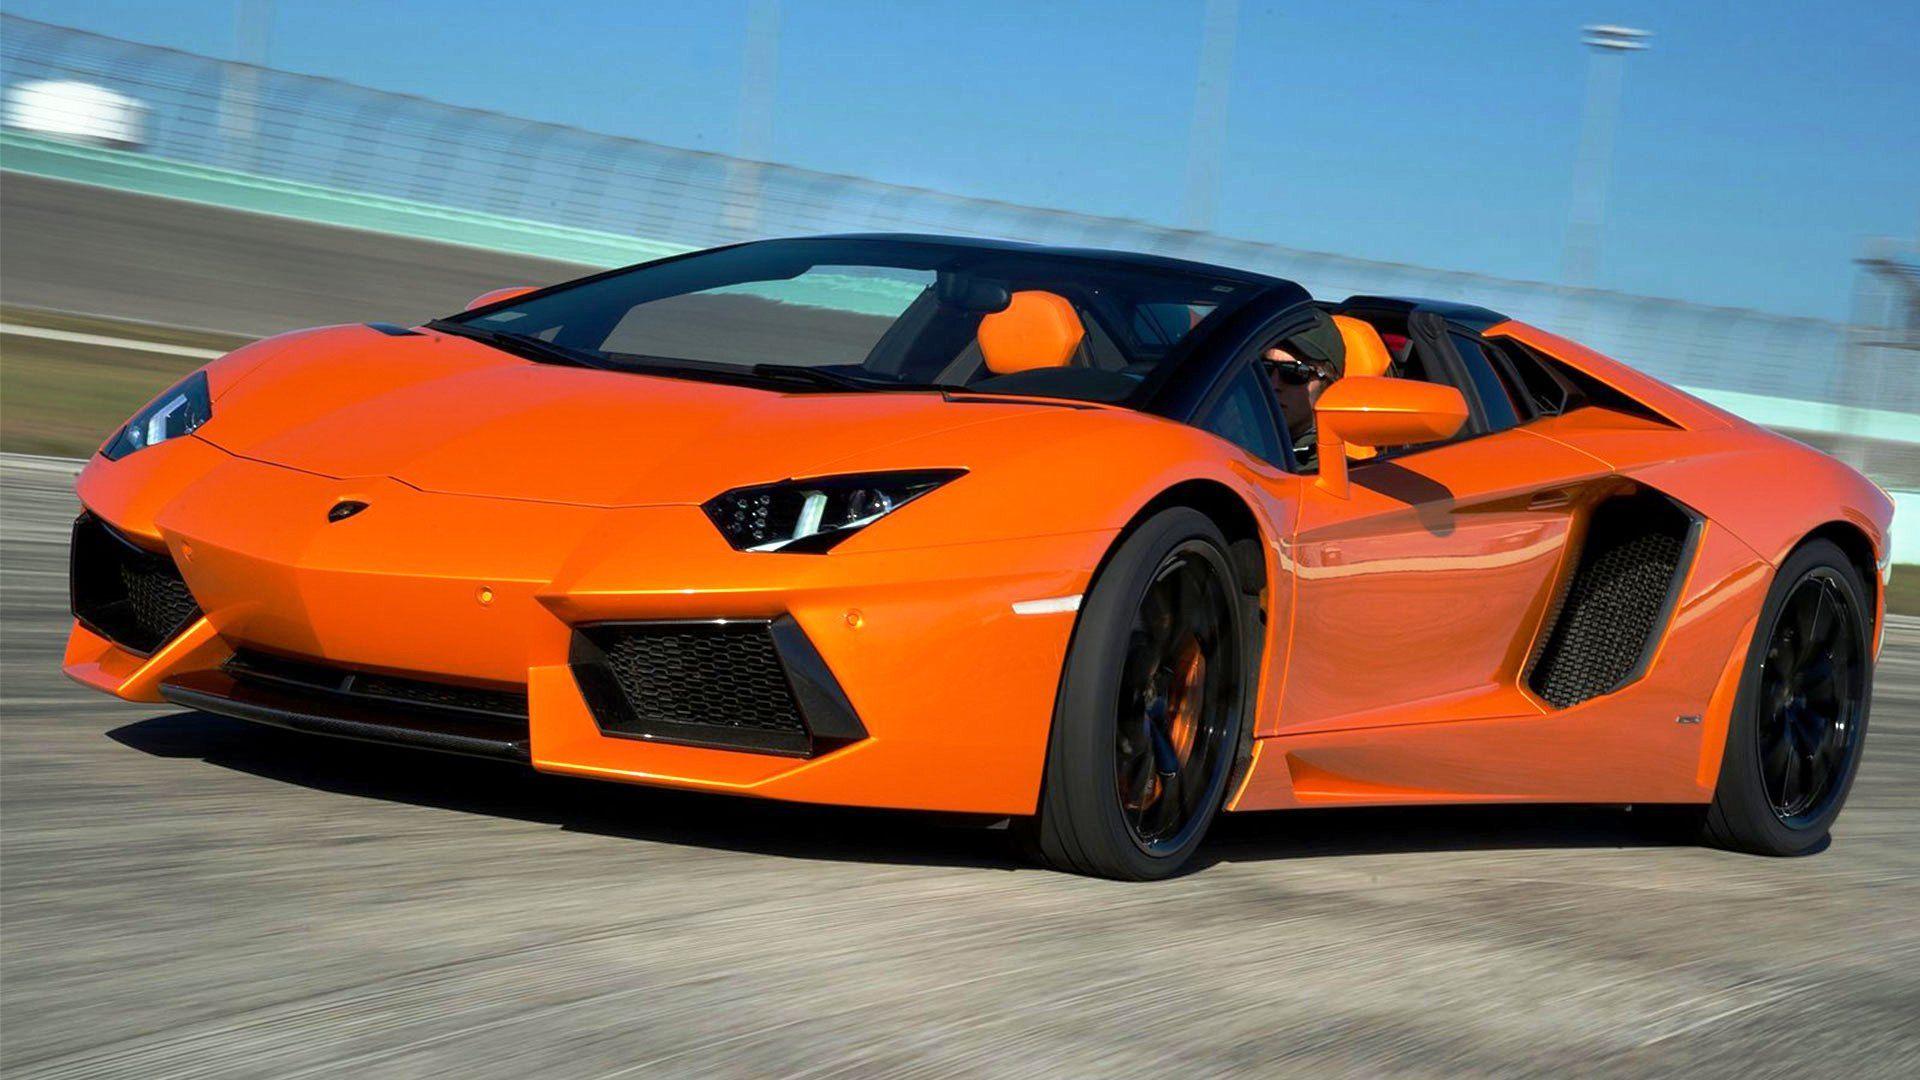 Wallpaper Full Hd 1080p Lamborghini New 2018 79 Images: Wallpaper Full Hd 1080p Lamborghini New 2015